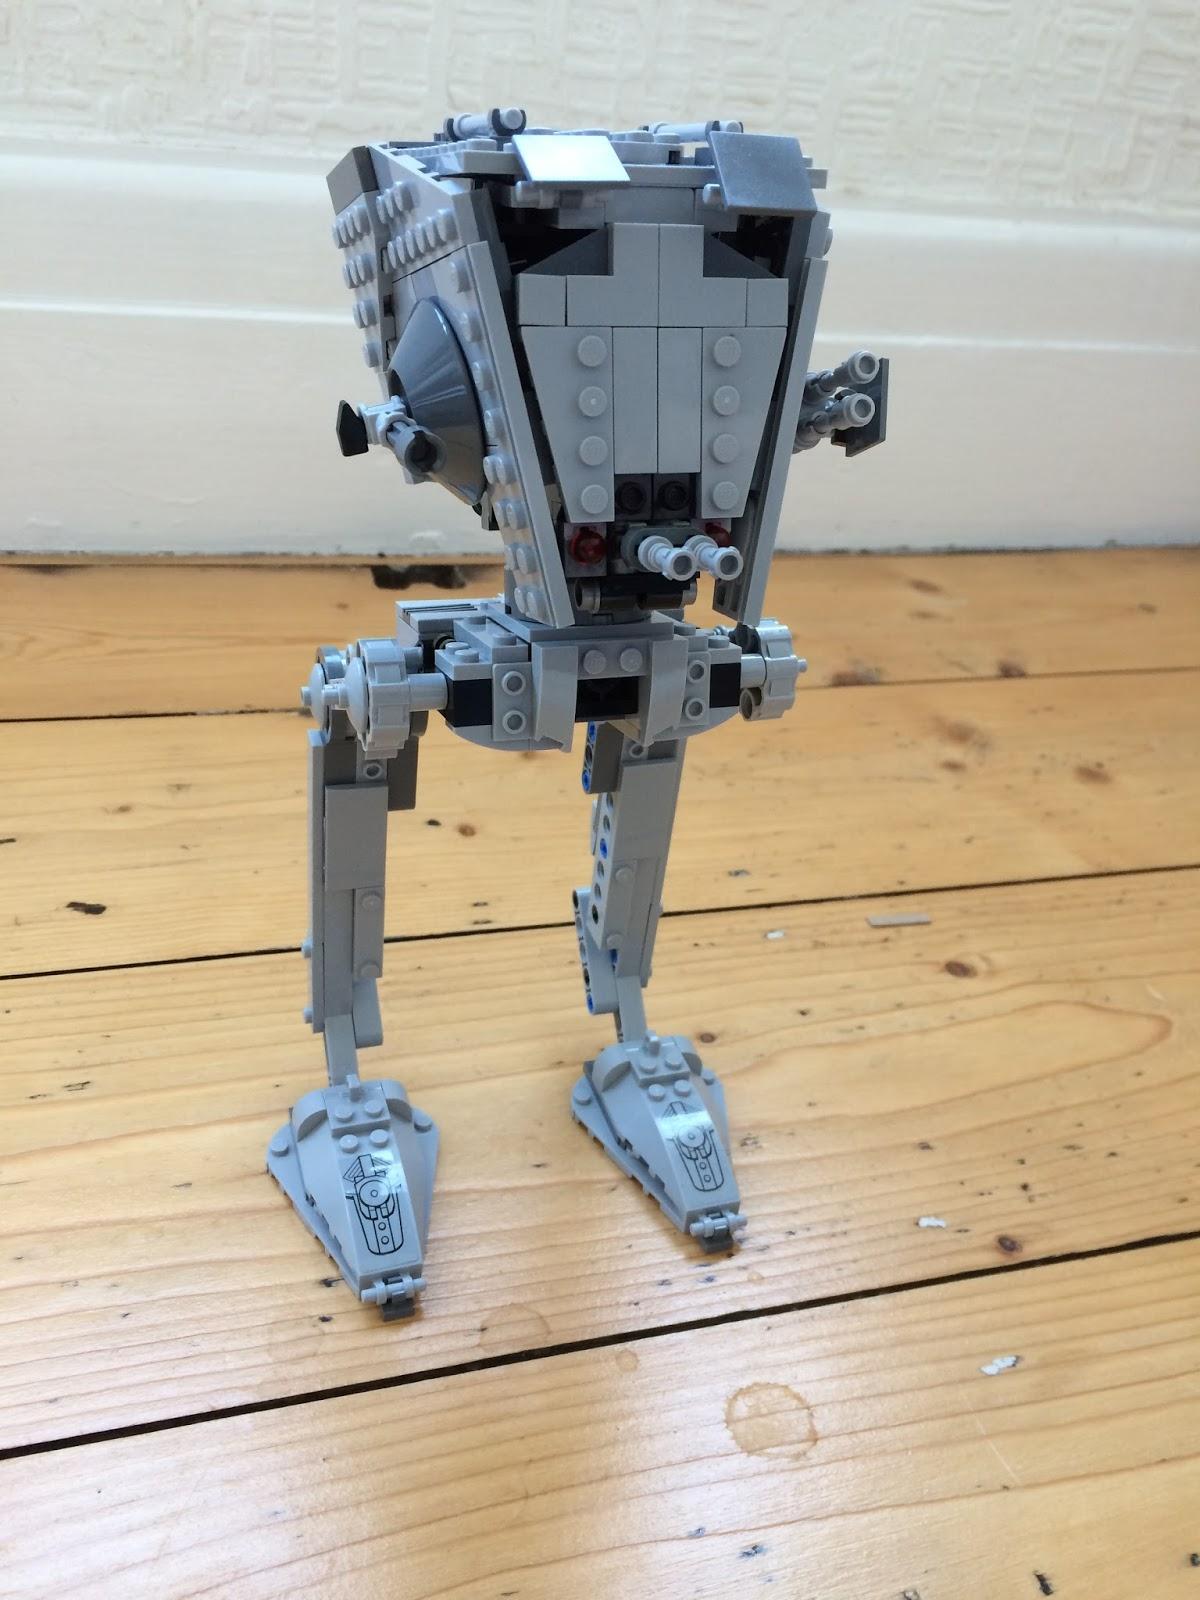 The Lego Star Wars R1 AT-ST Walker 75153 assembled